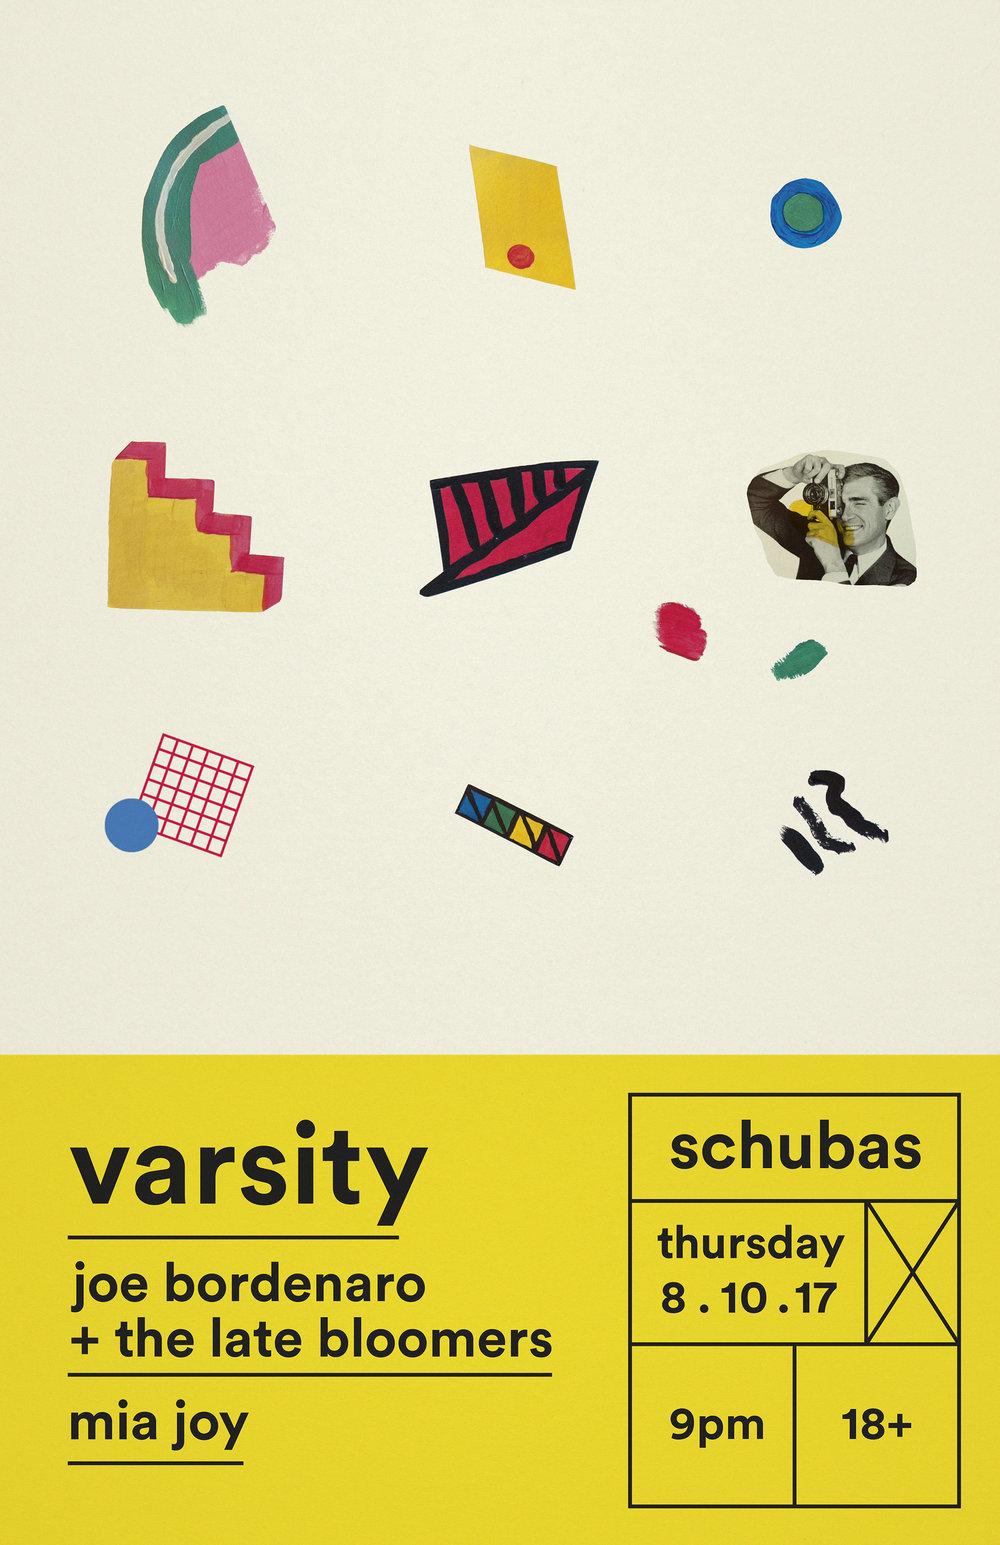 VARSITY_SCHUBAS.jpg